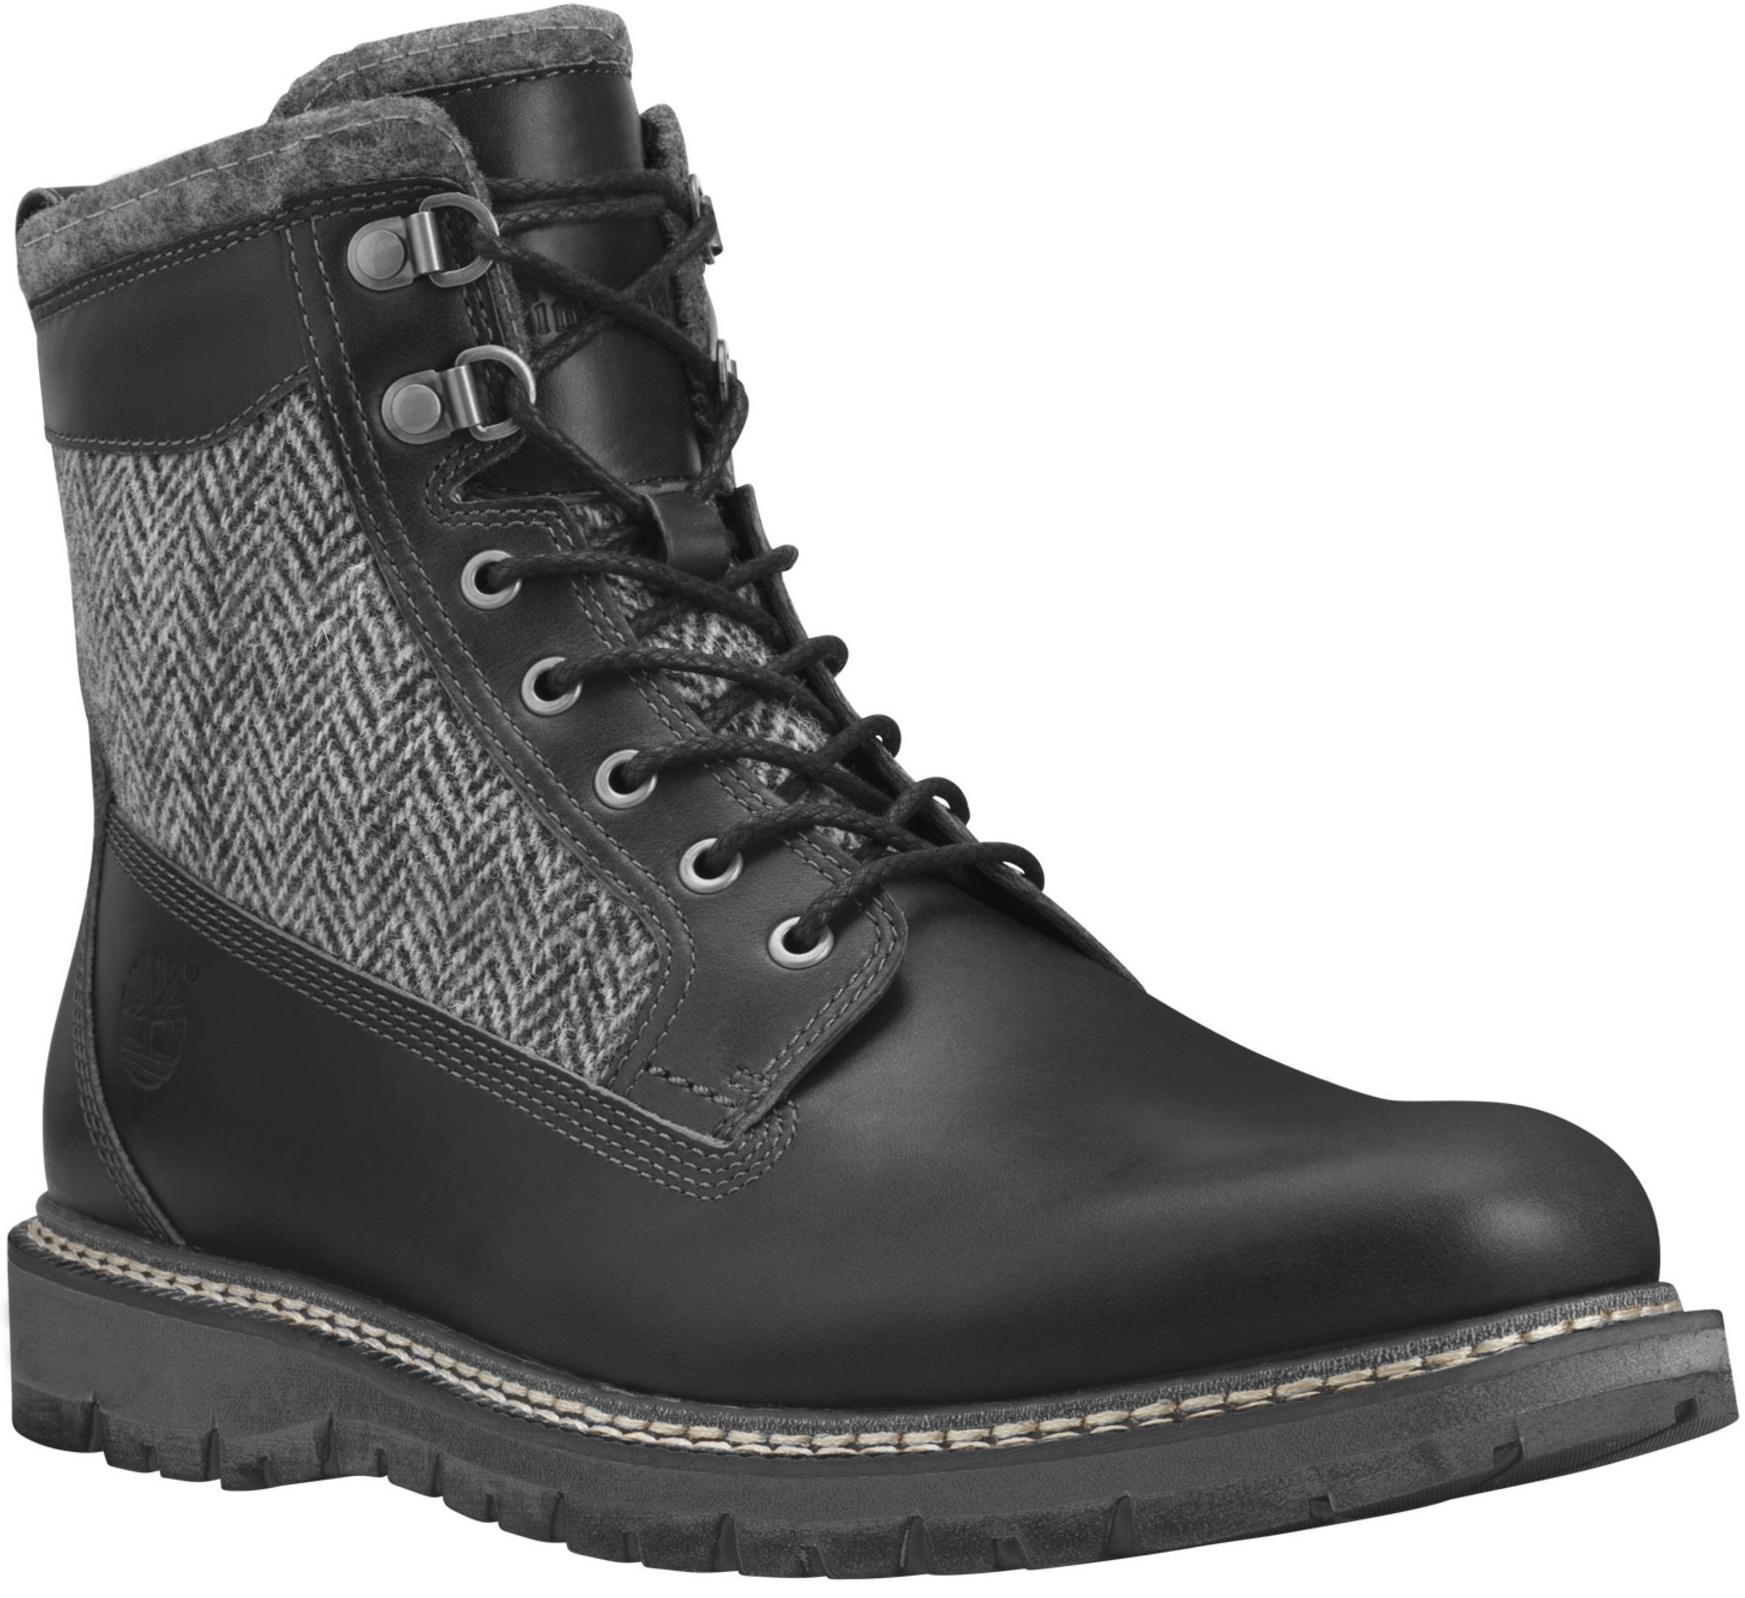 Timberland Britton Hill Six-Inch Winter Boot, $240